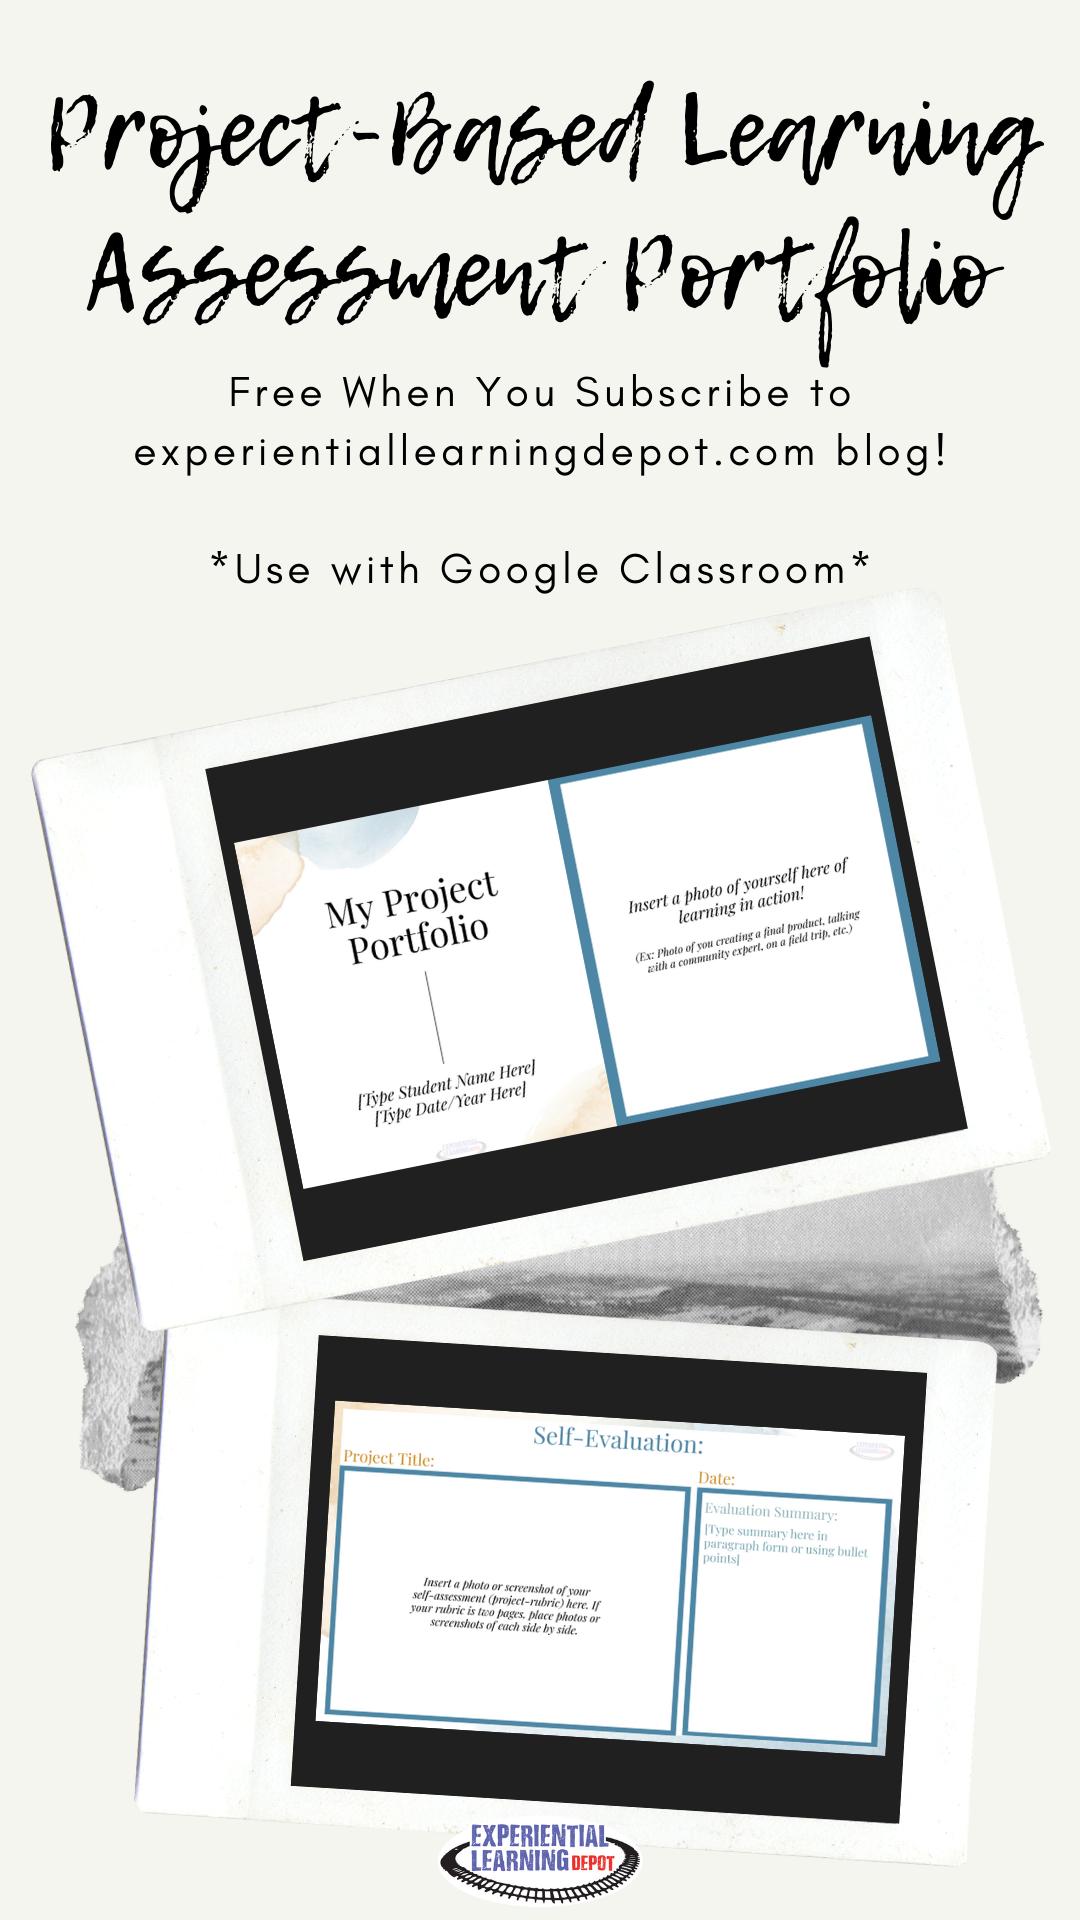 Project Based Learning Assessment Portfolio For